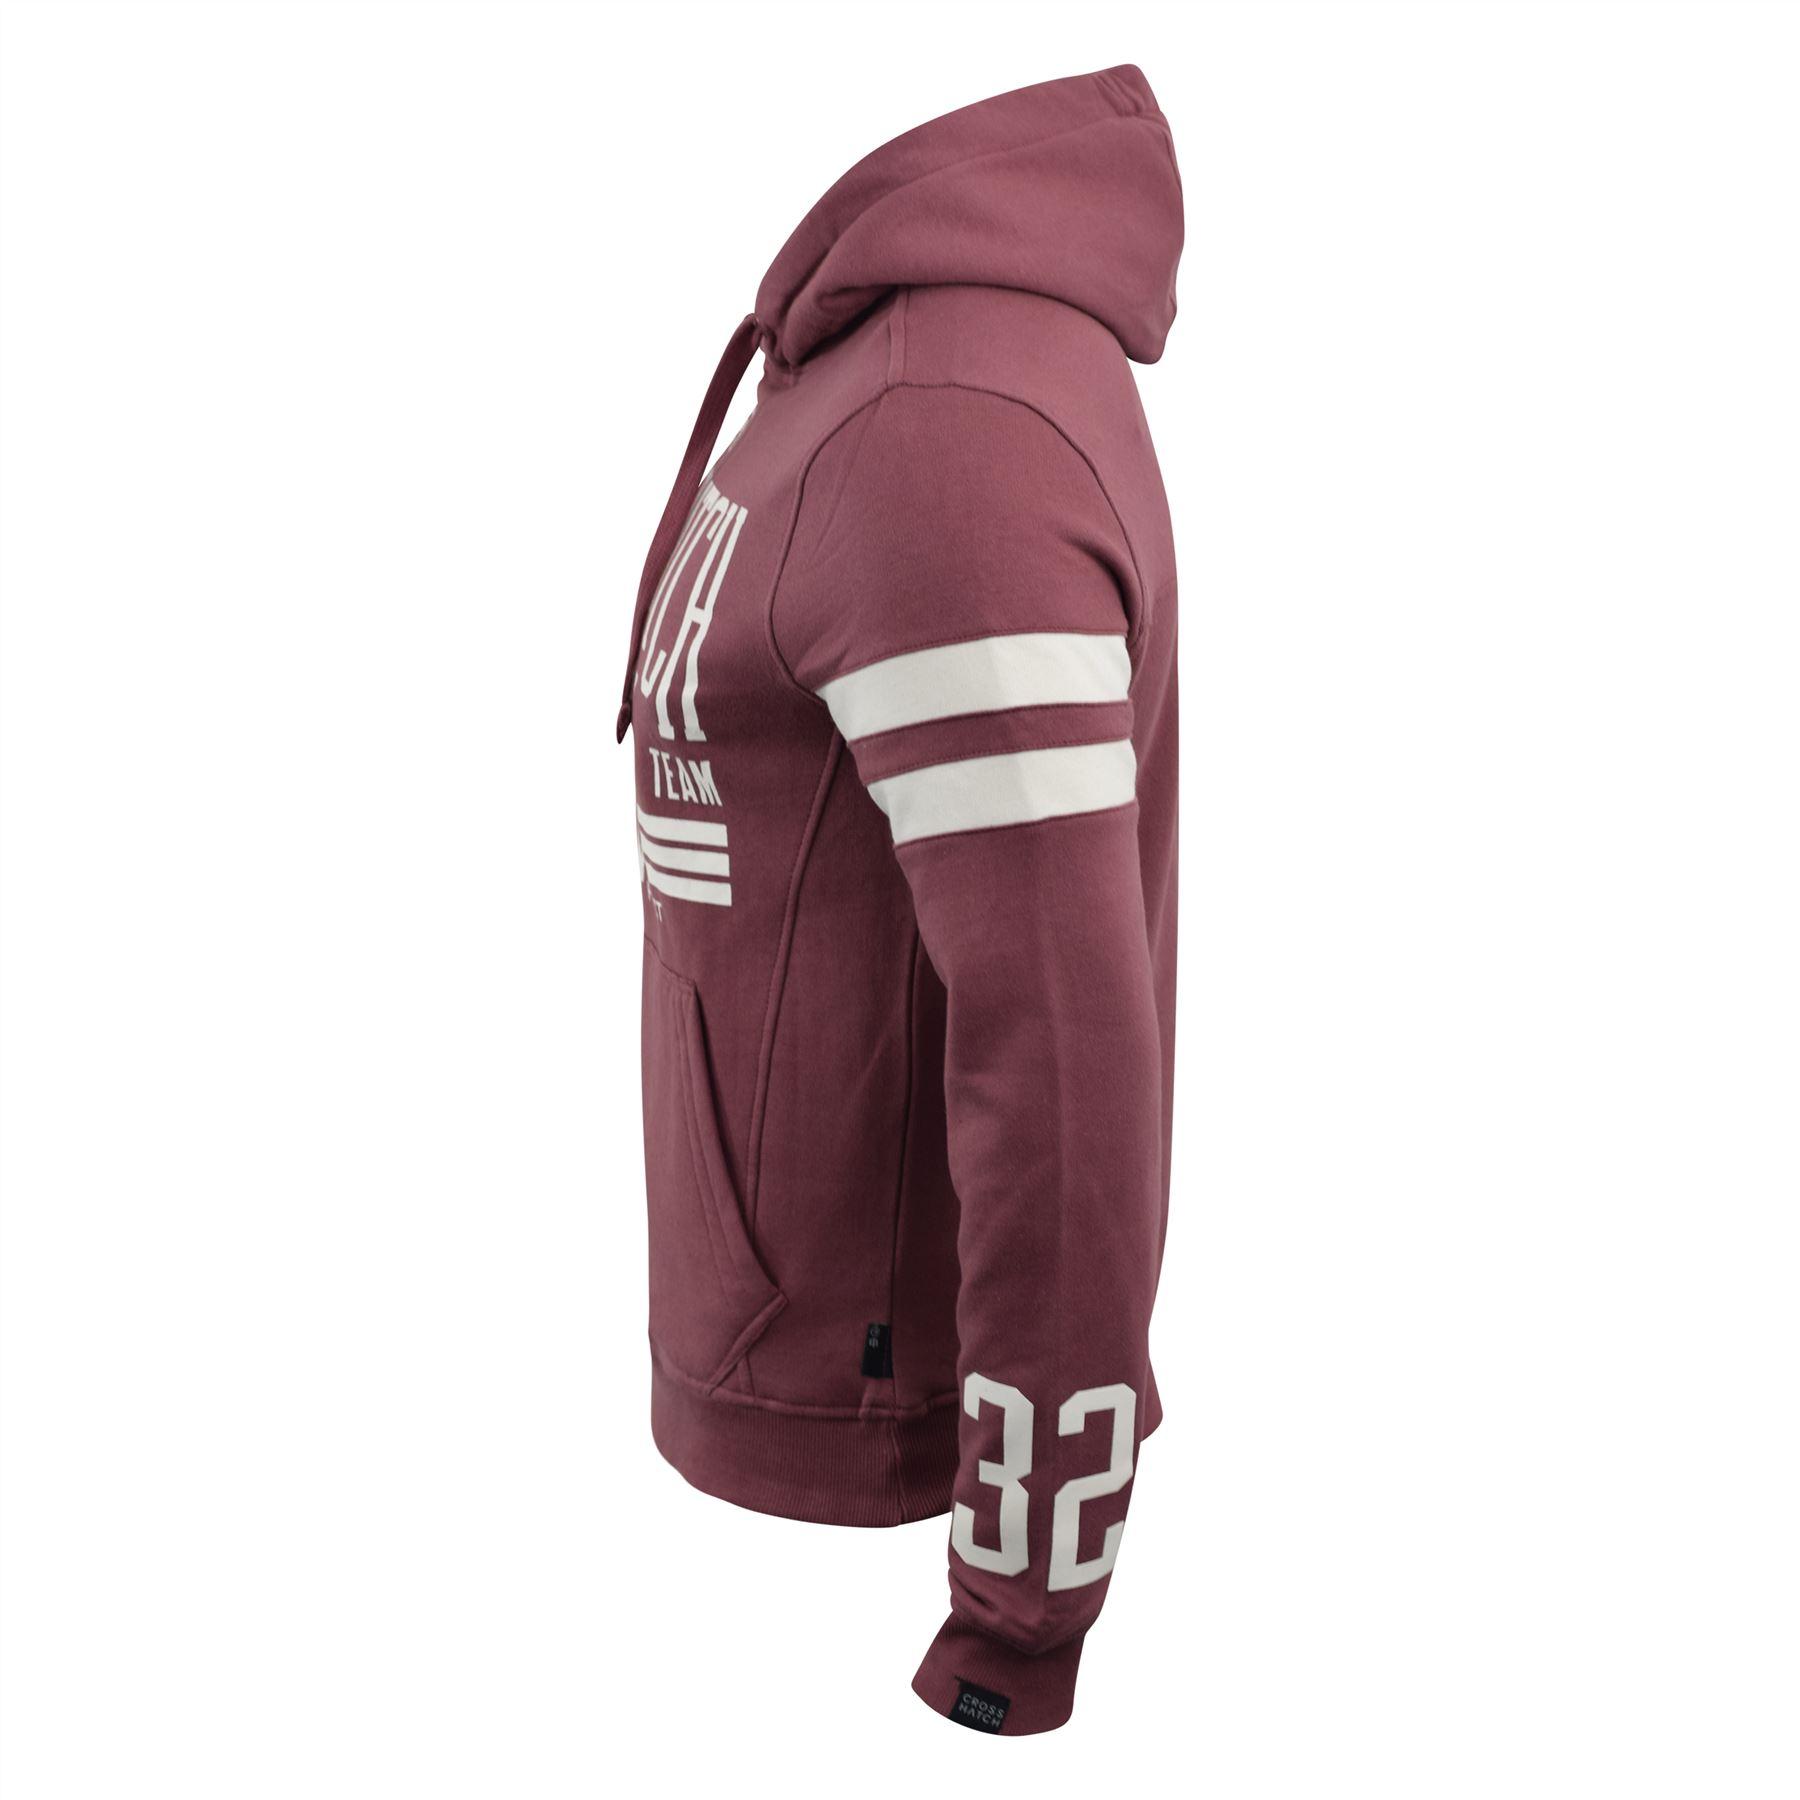 Mens-Hoodie-Crosshatch-Clothing-Sweatshirt-Hooded-Jumper-Top-Pullover-Cramform thumbnail 6